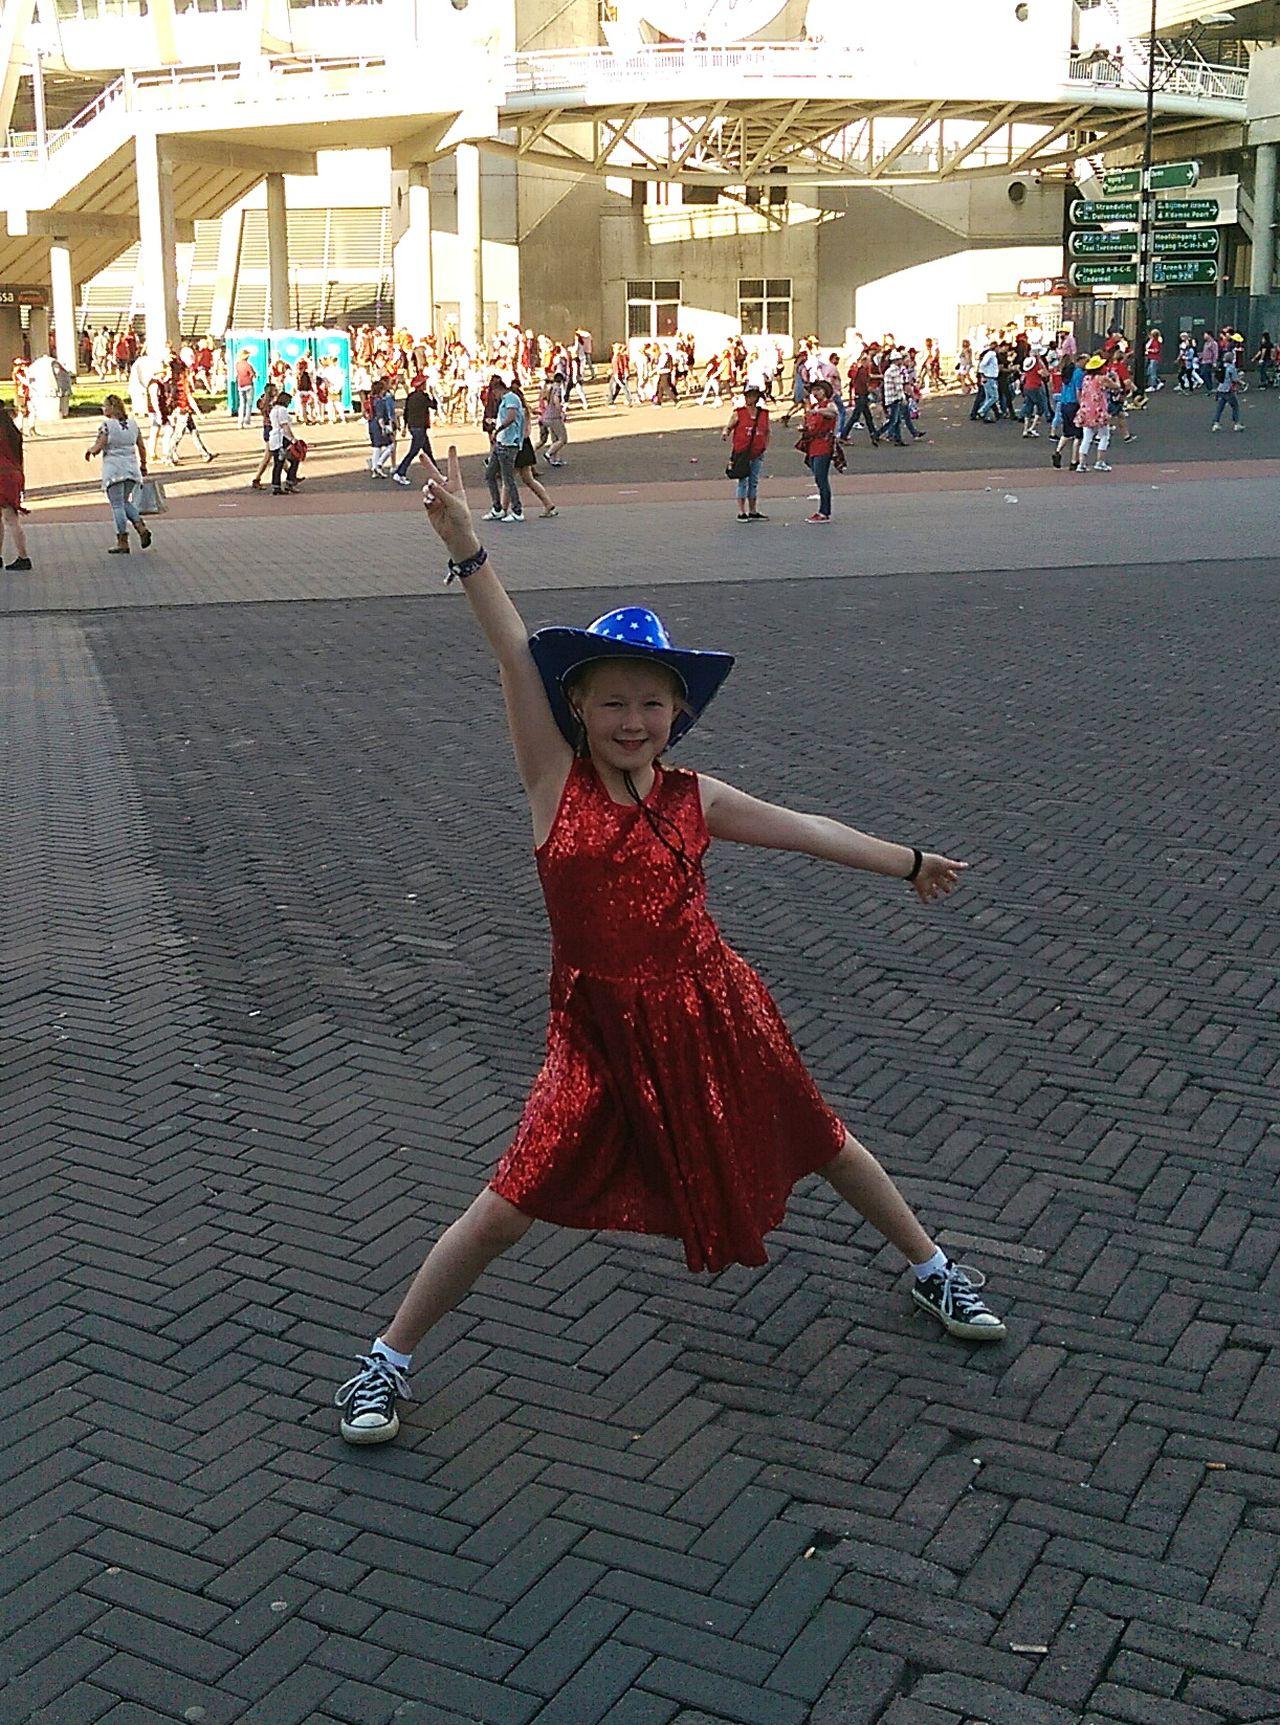 Dancing Girl Outdoors City Street Art Performance Red Dress Hat